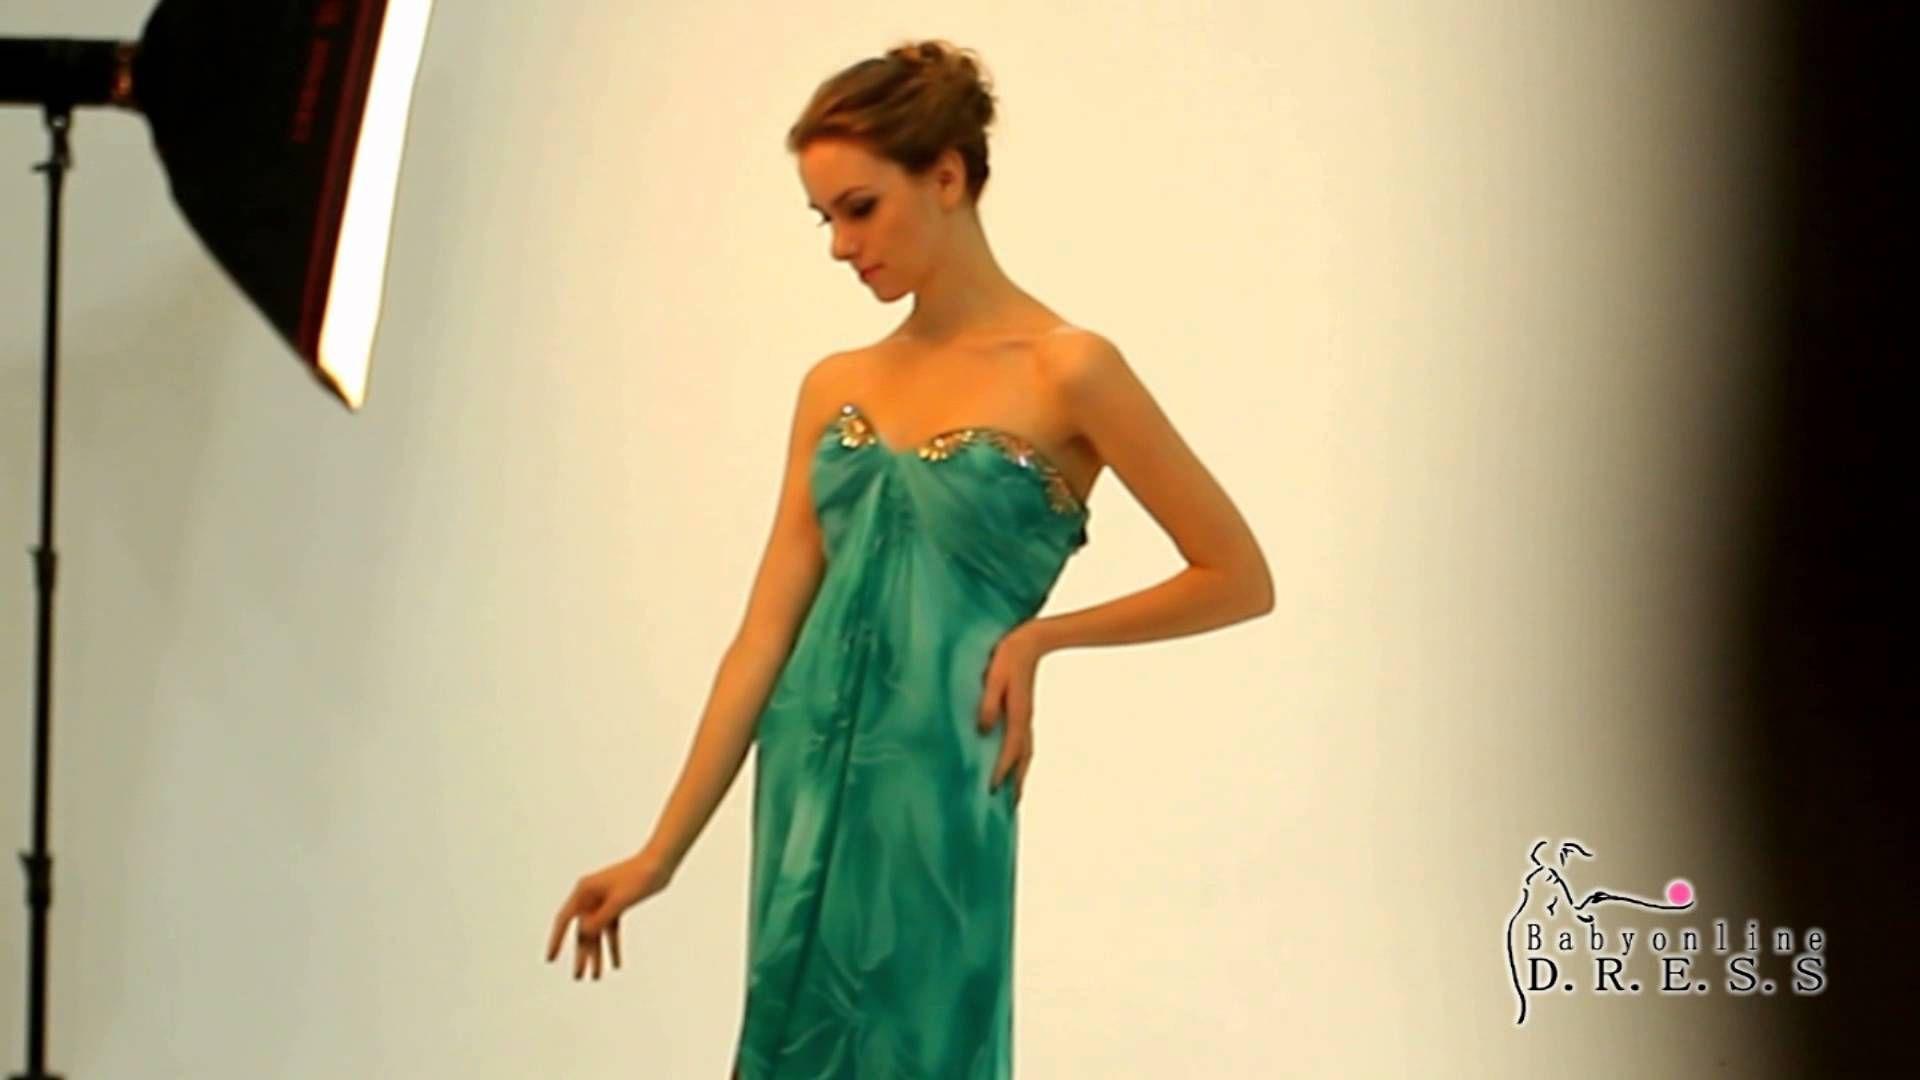 Babyonlinedress prom dresses播放列表 hot party dresses